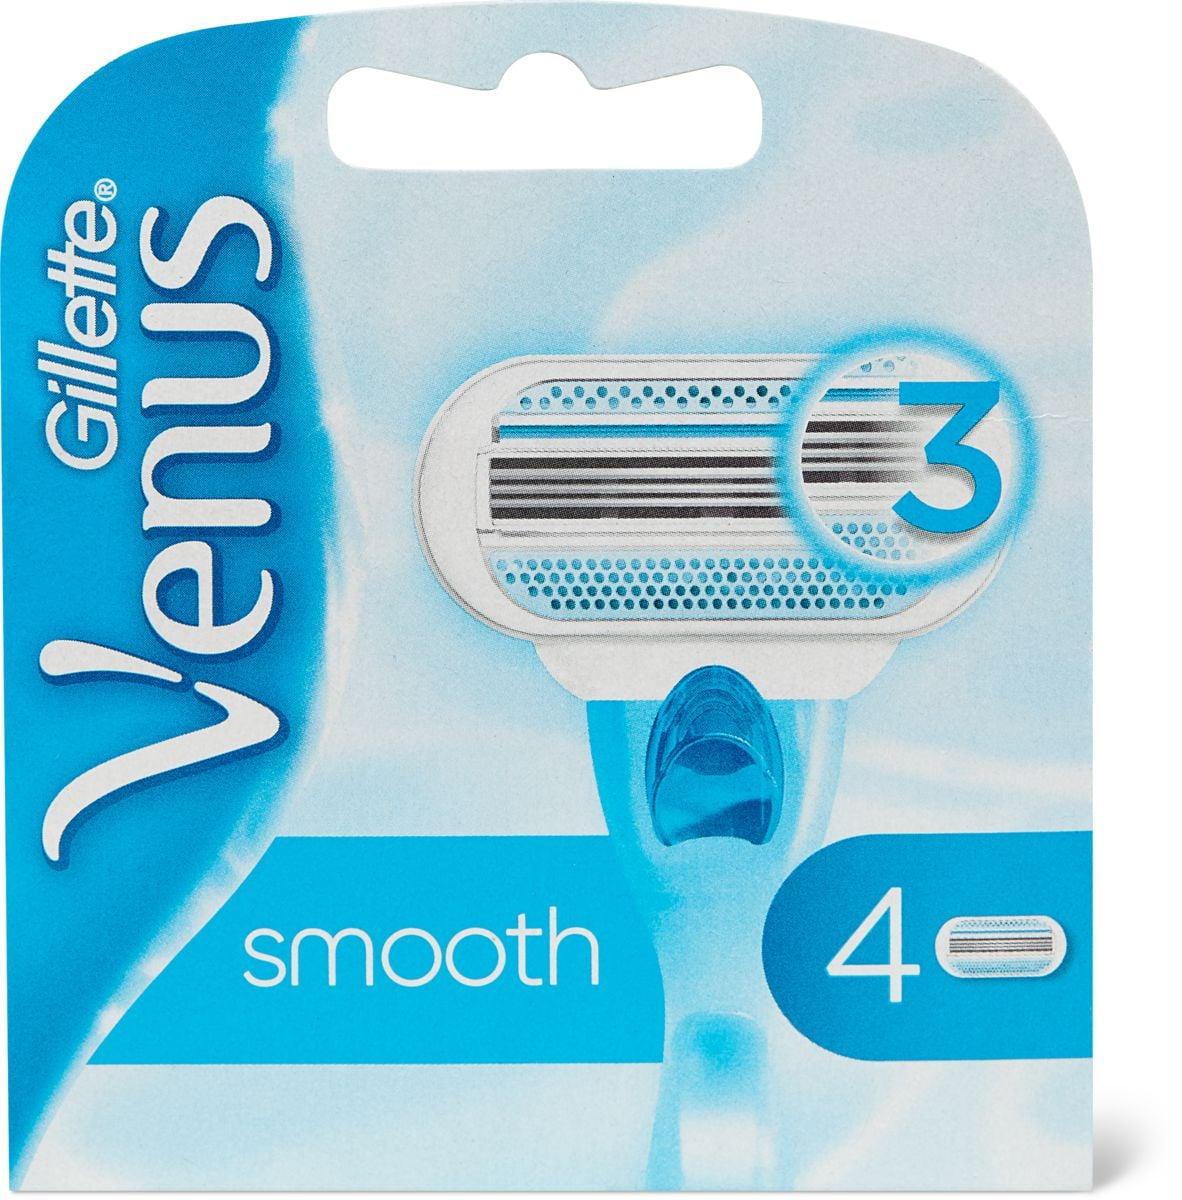 Gillette Venus Smooth lame